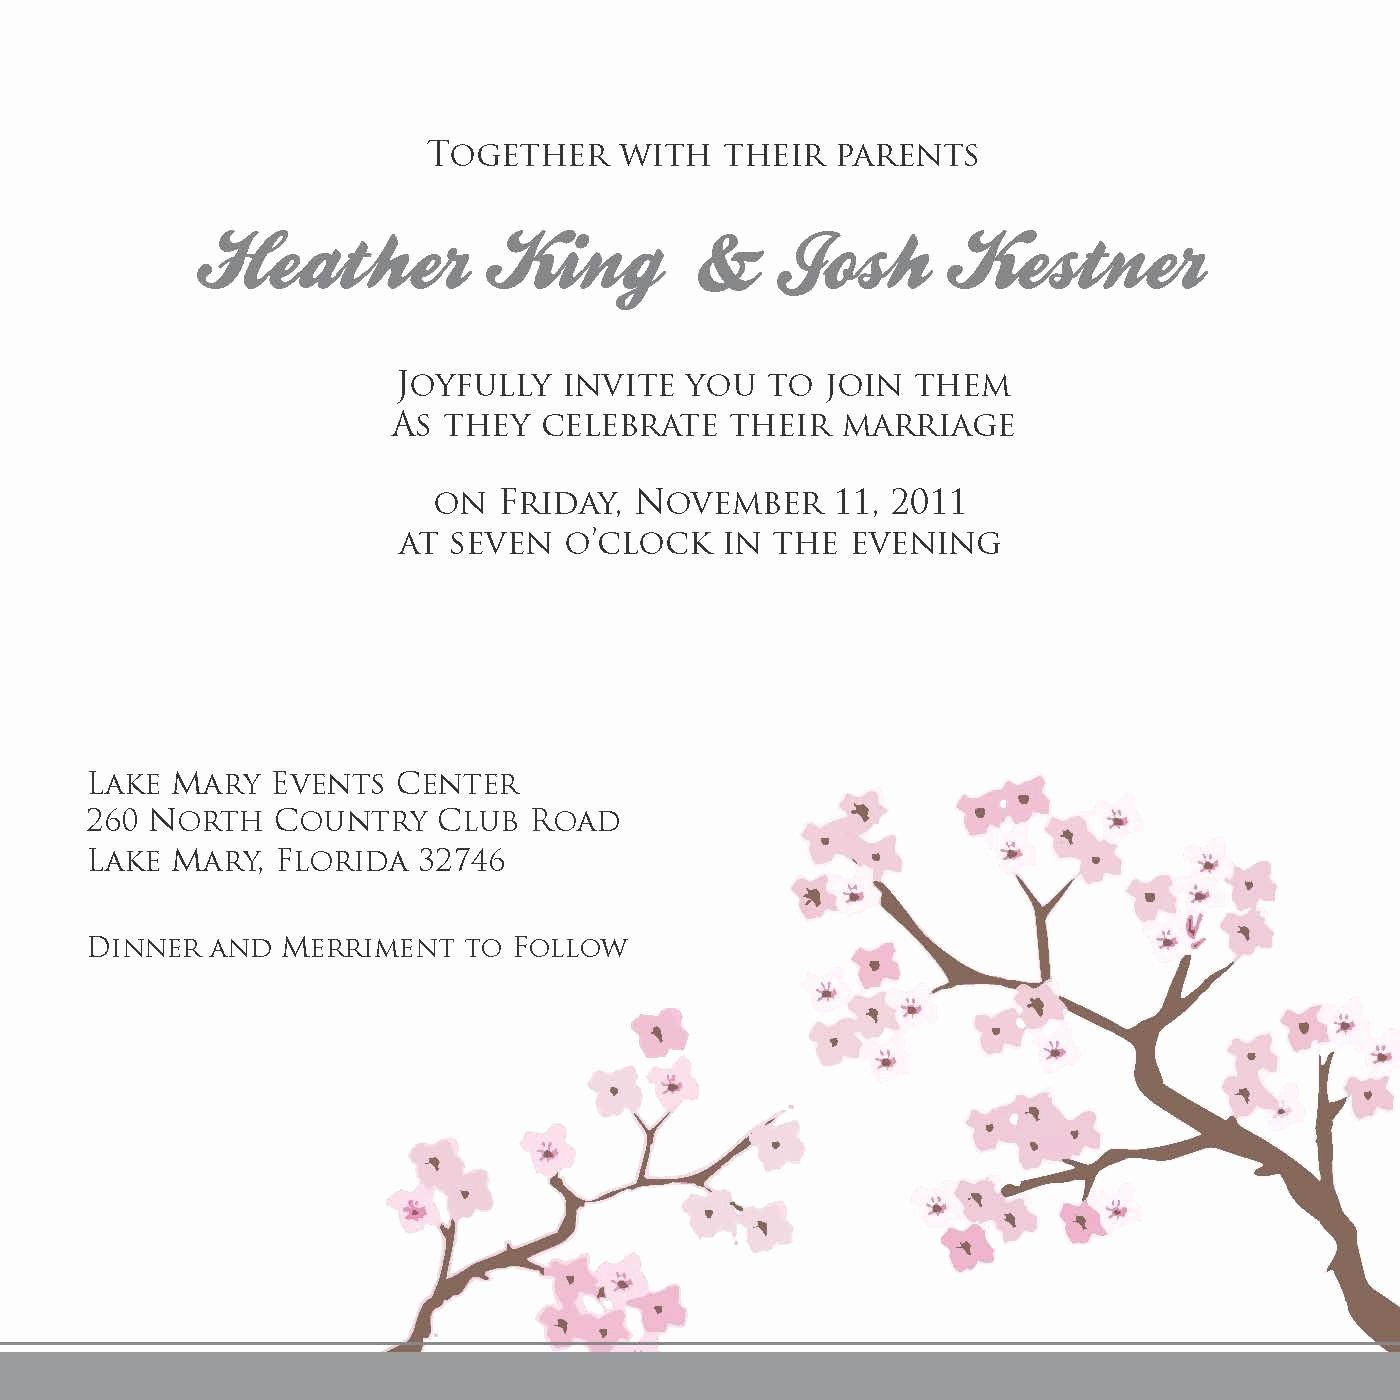 Wedding Invite Template Word Elegant Free Wedding Invitation Templates for Word